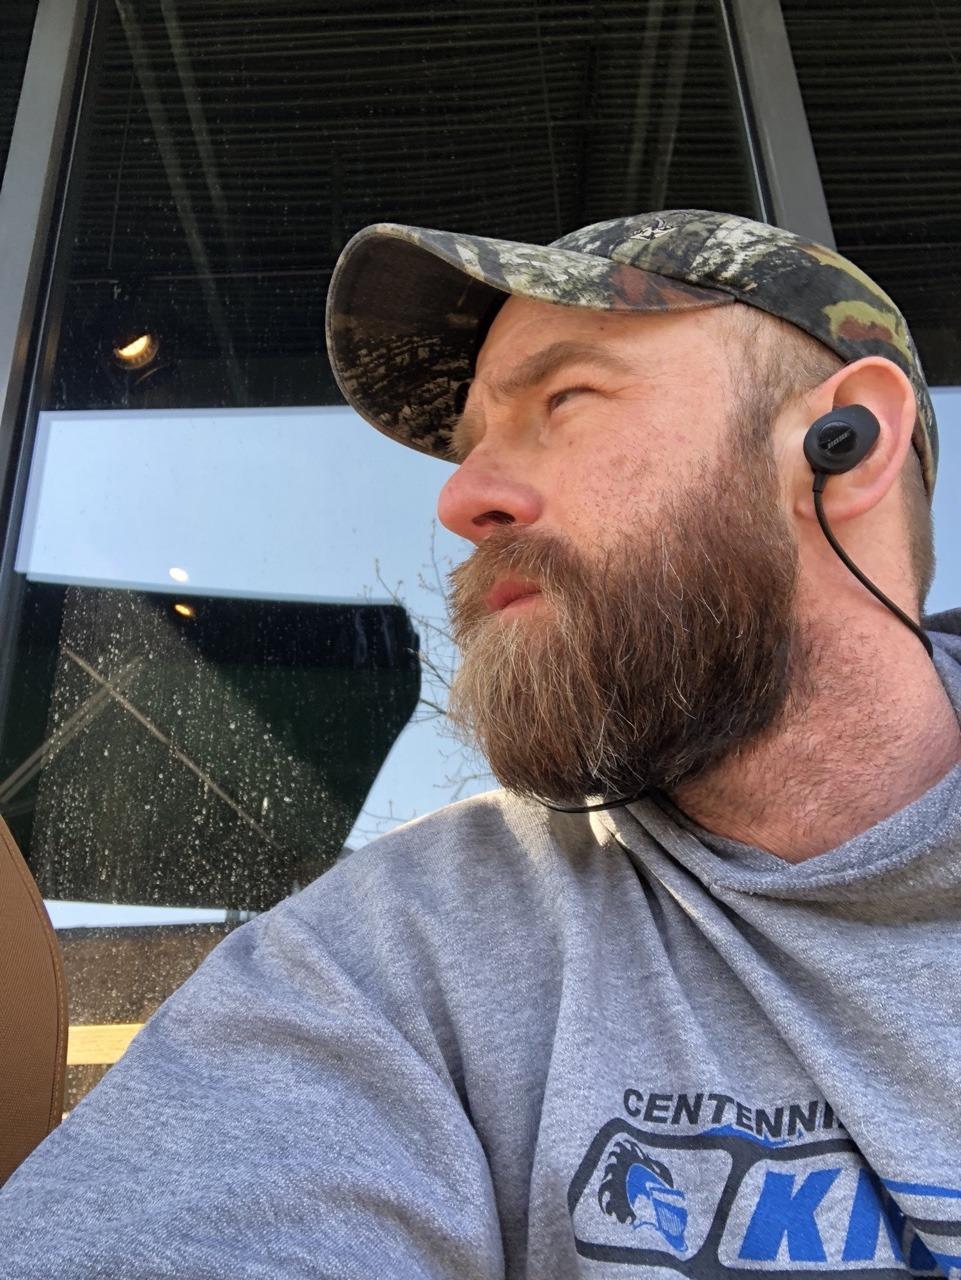 2018-06-04 05:20:19 - jackdixonxx twitter beardburnme http://www.neofic.com